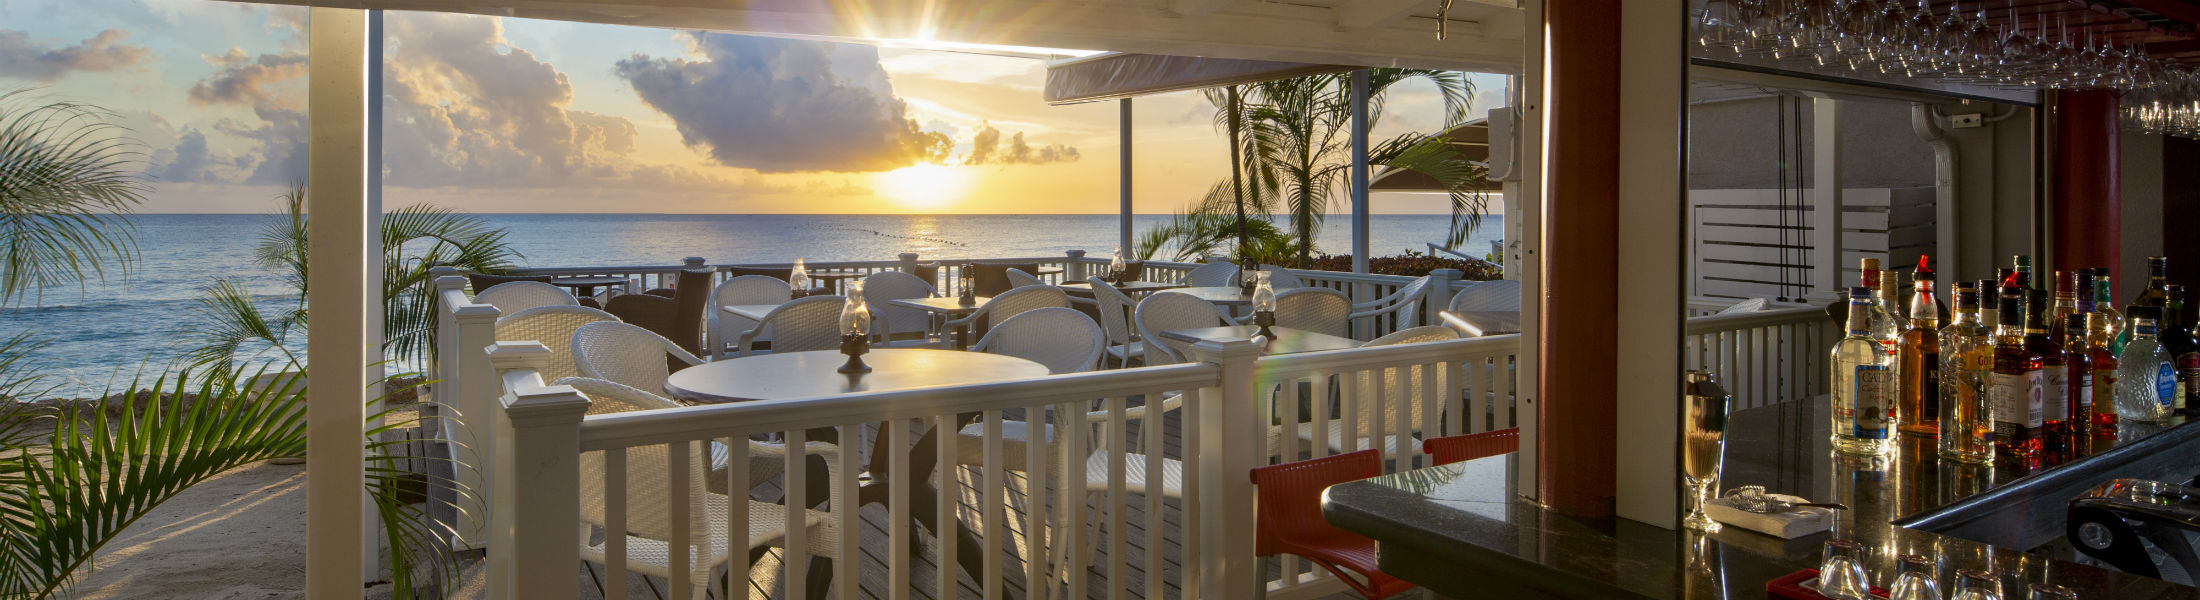 club-beach bar at The Club Barbados Resort & Spa, Barbados